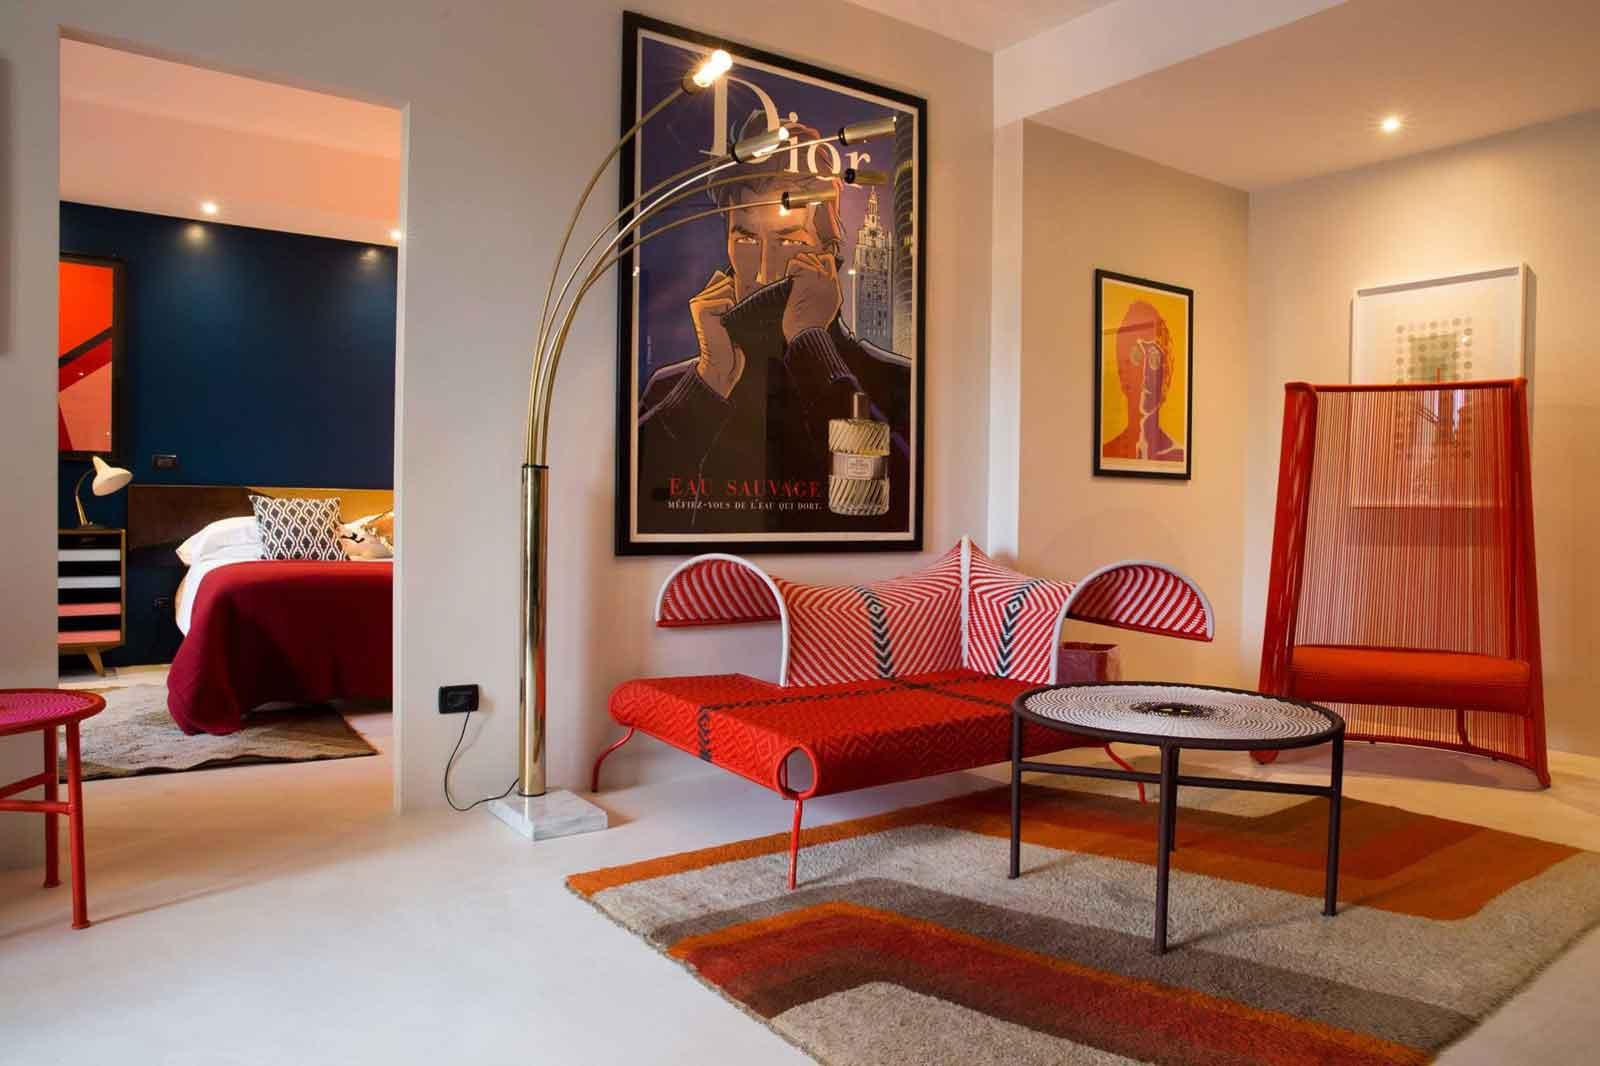 Hotel Vérone Italie : salon suite Up